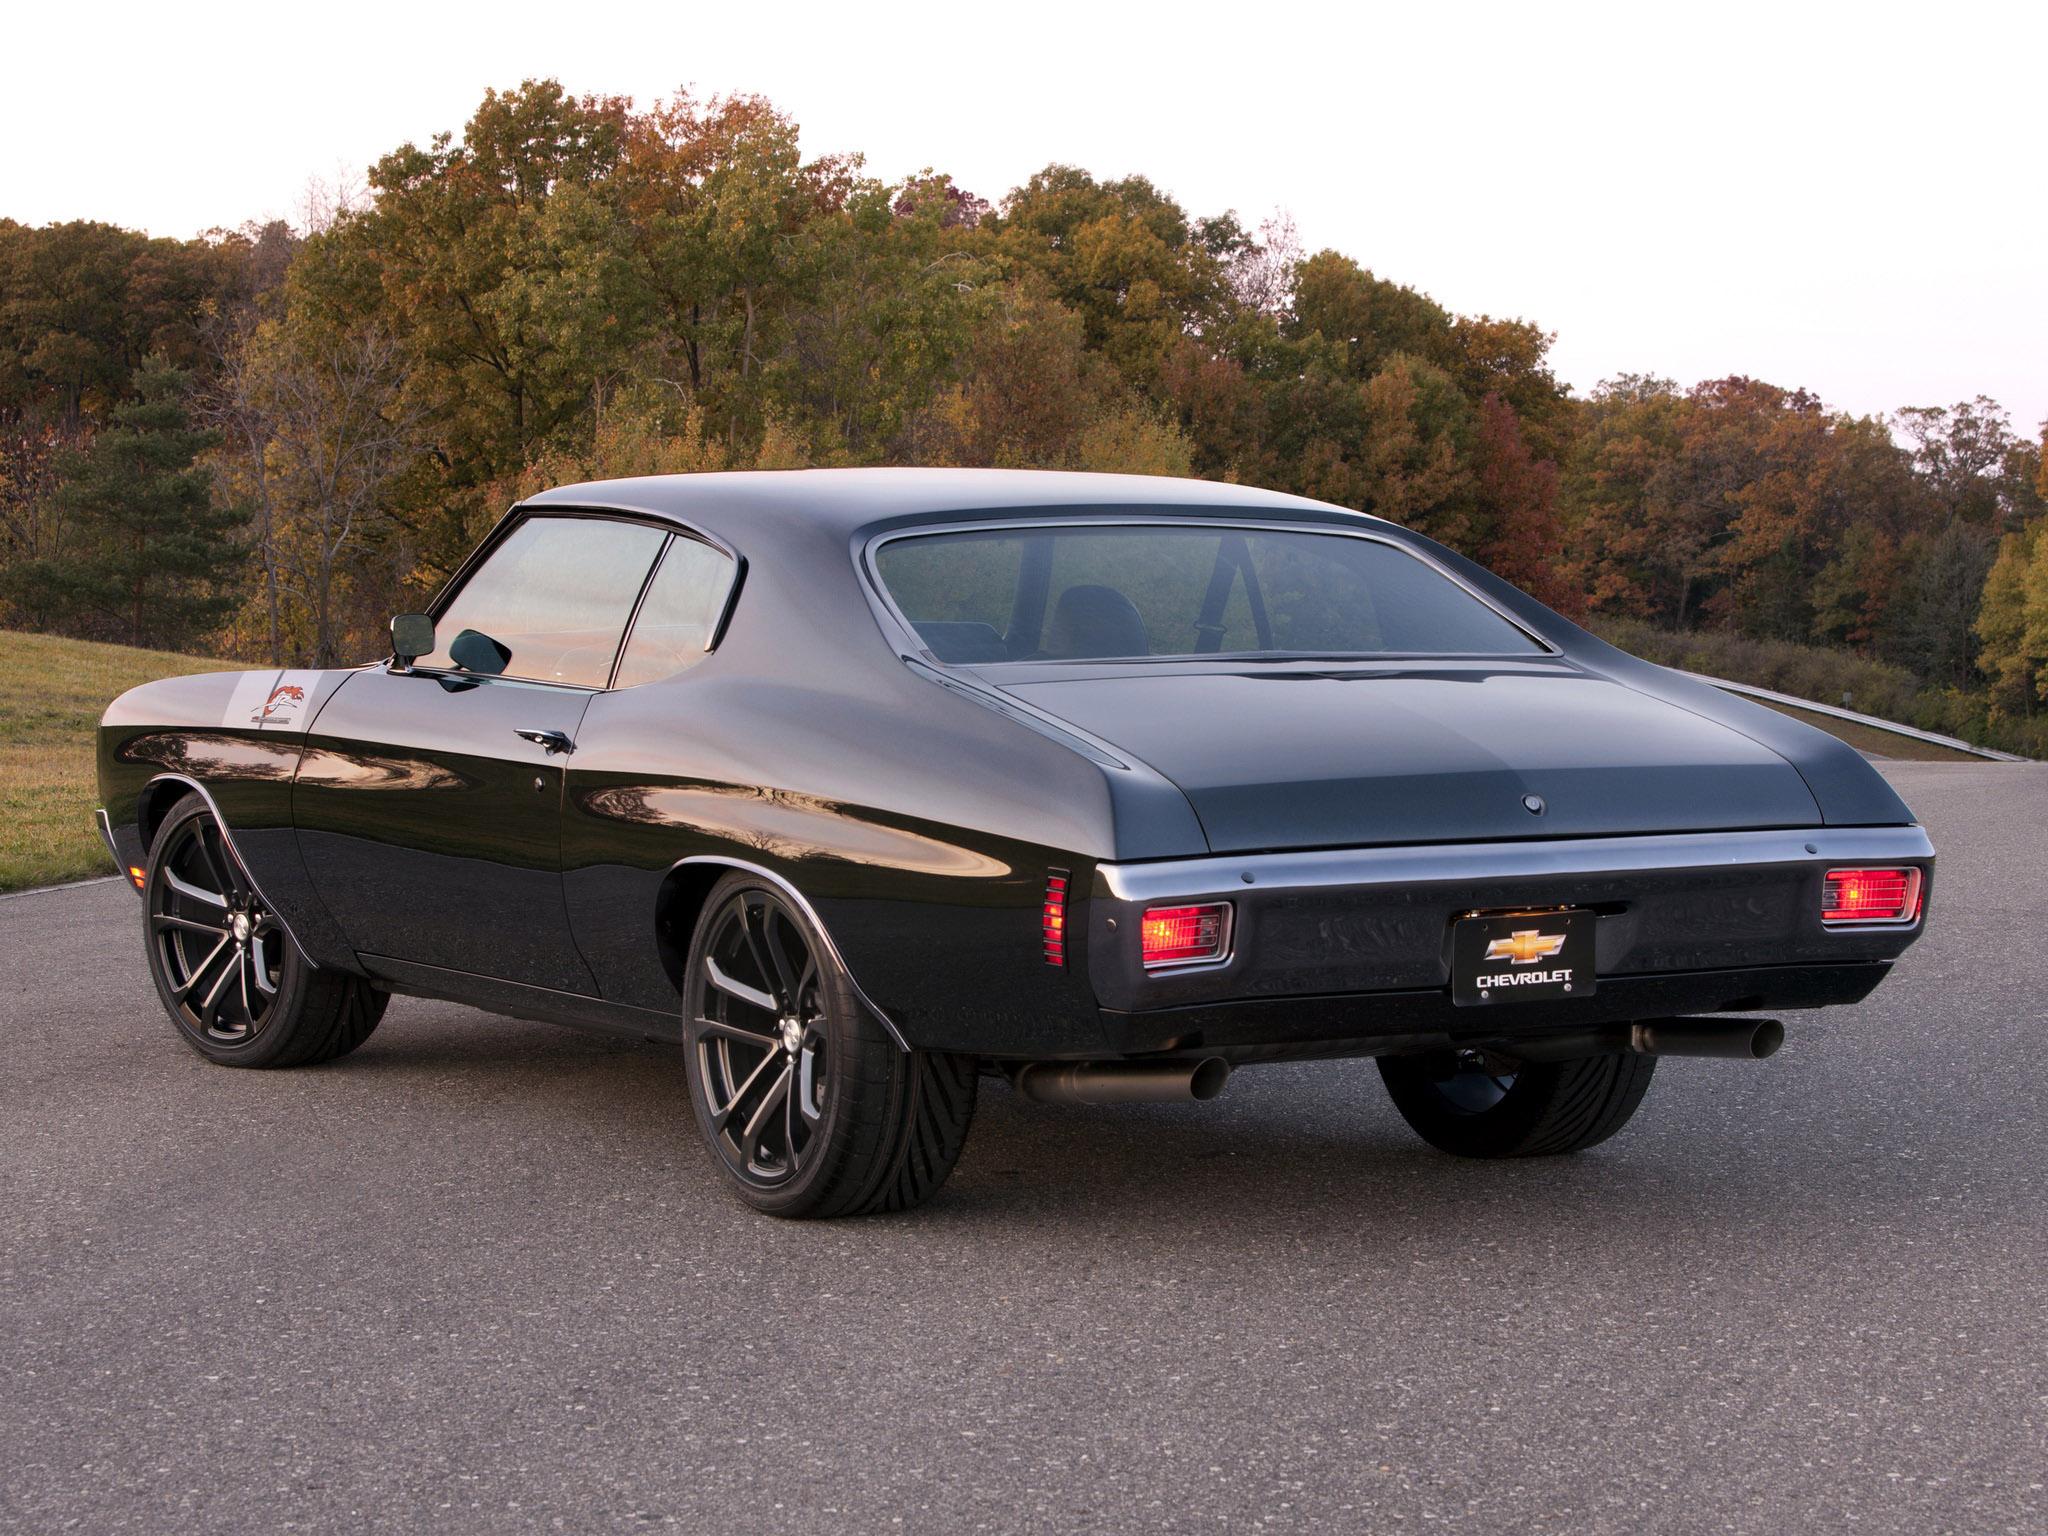 Chevrolet Impala SS 427 &#39-1969 | Classic Cars - Chevrolet ...